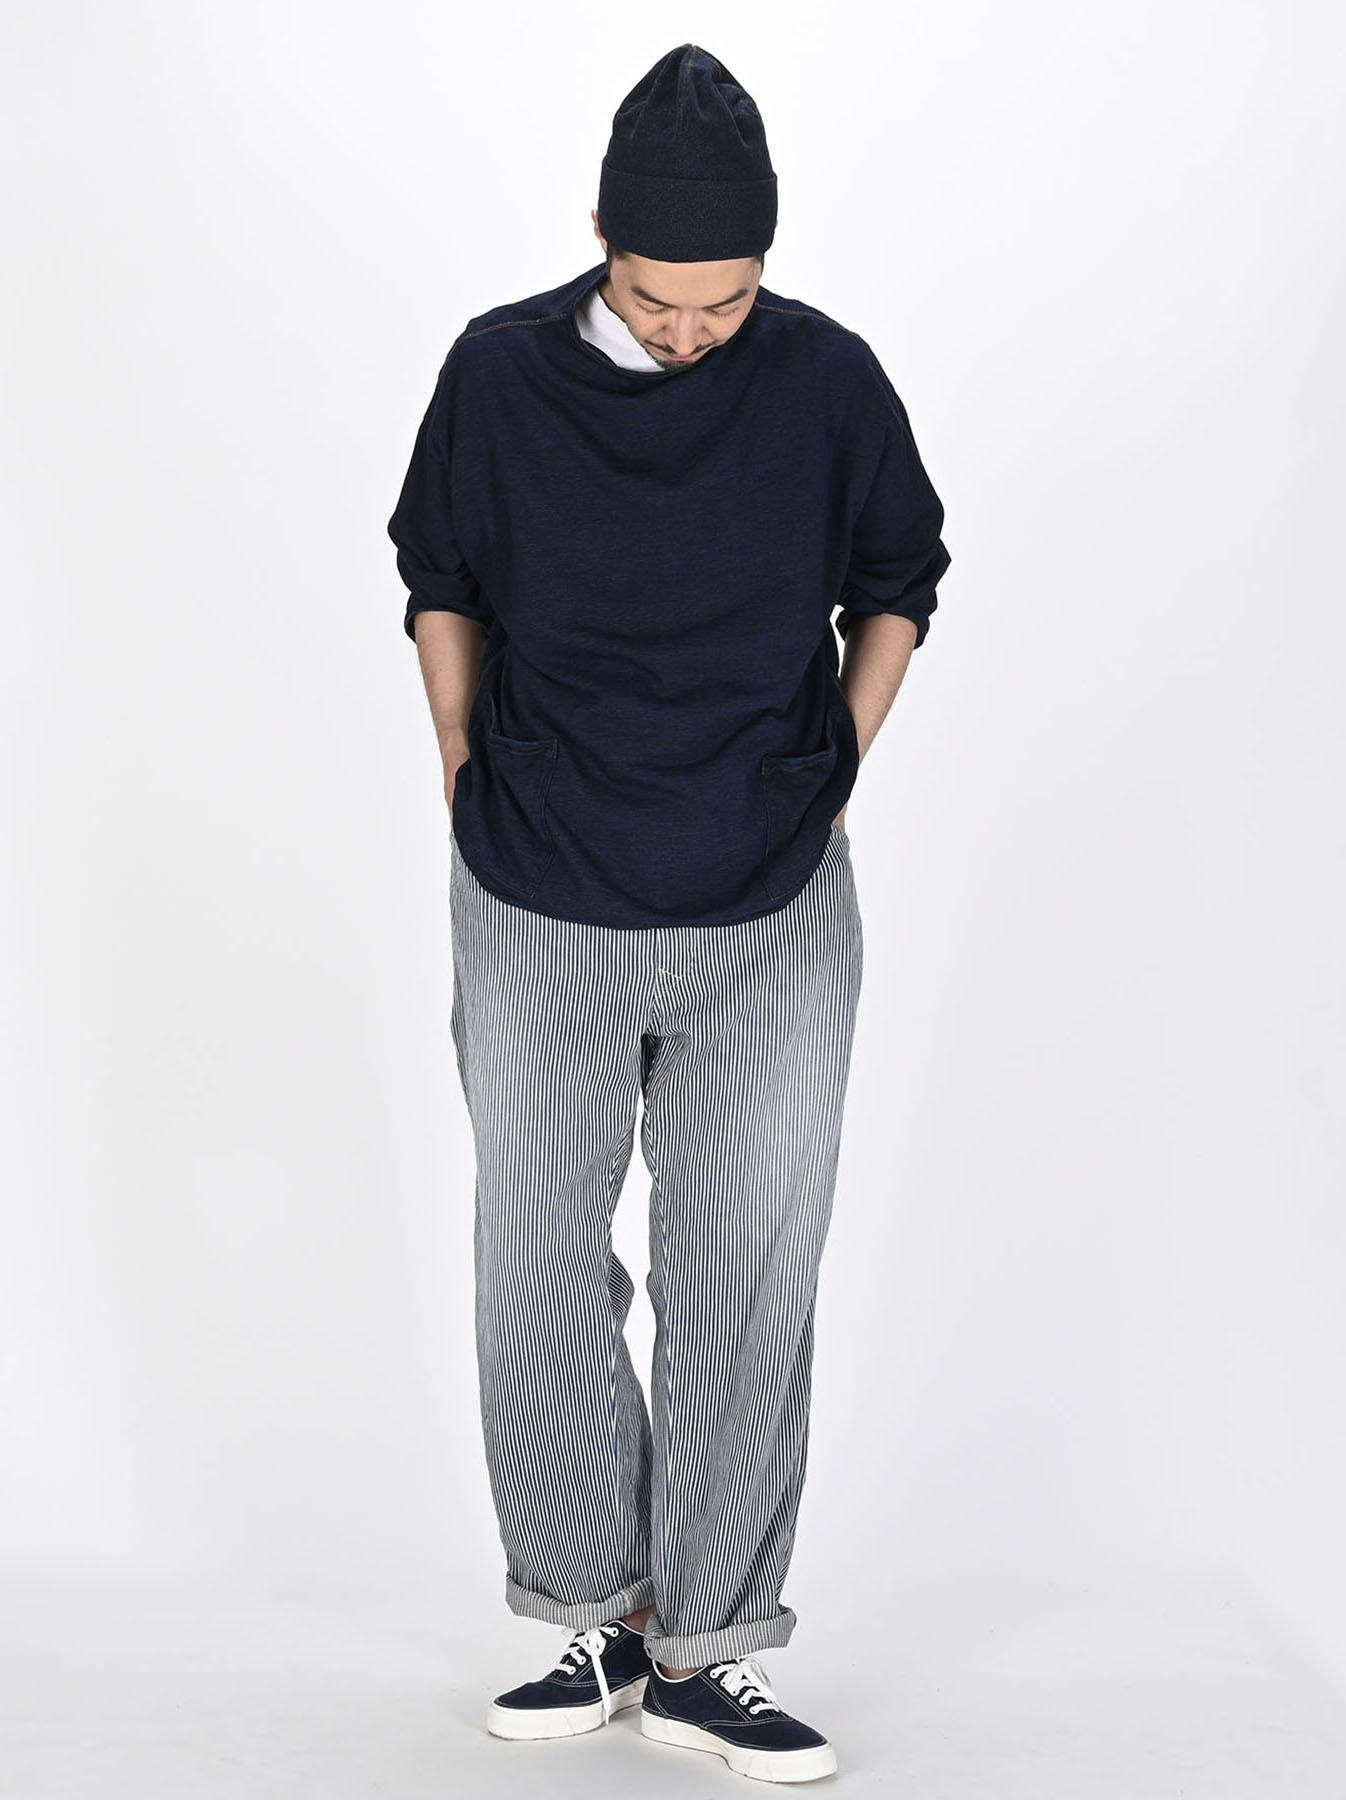 Indigo 908 Painter Pants Distressed (0721)-5